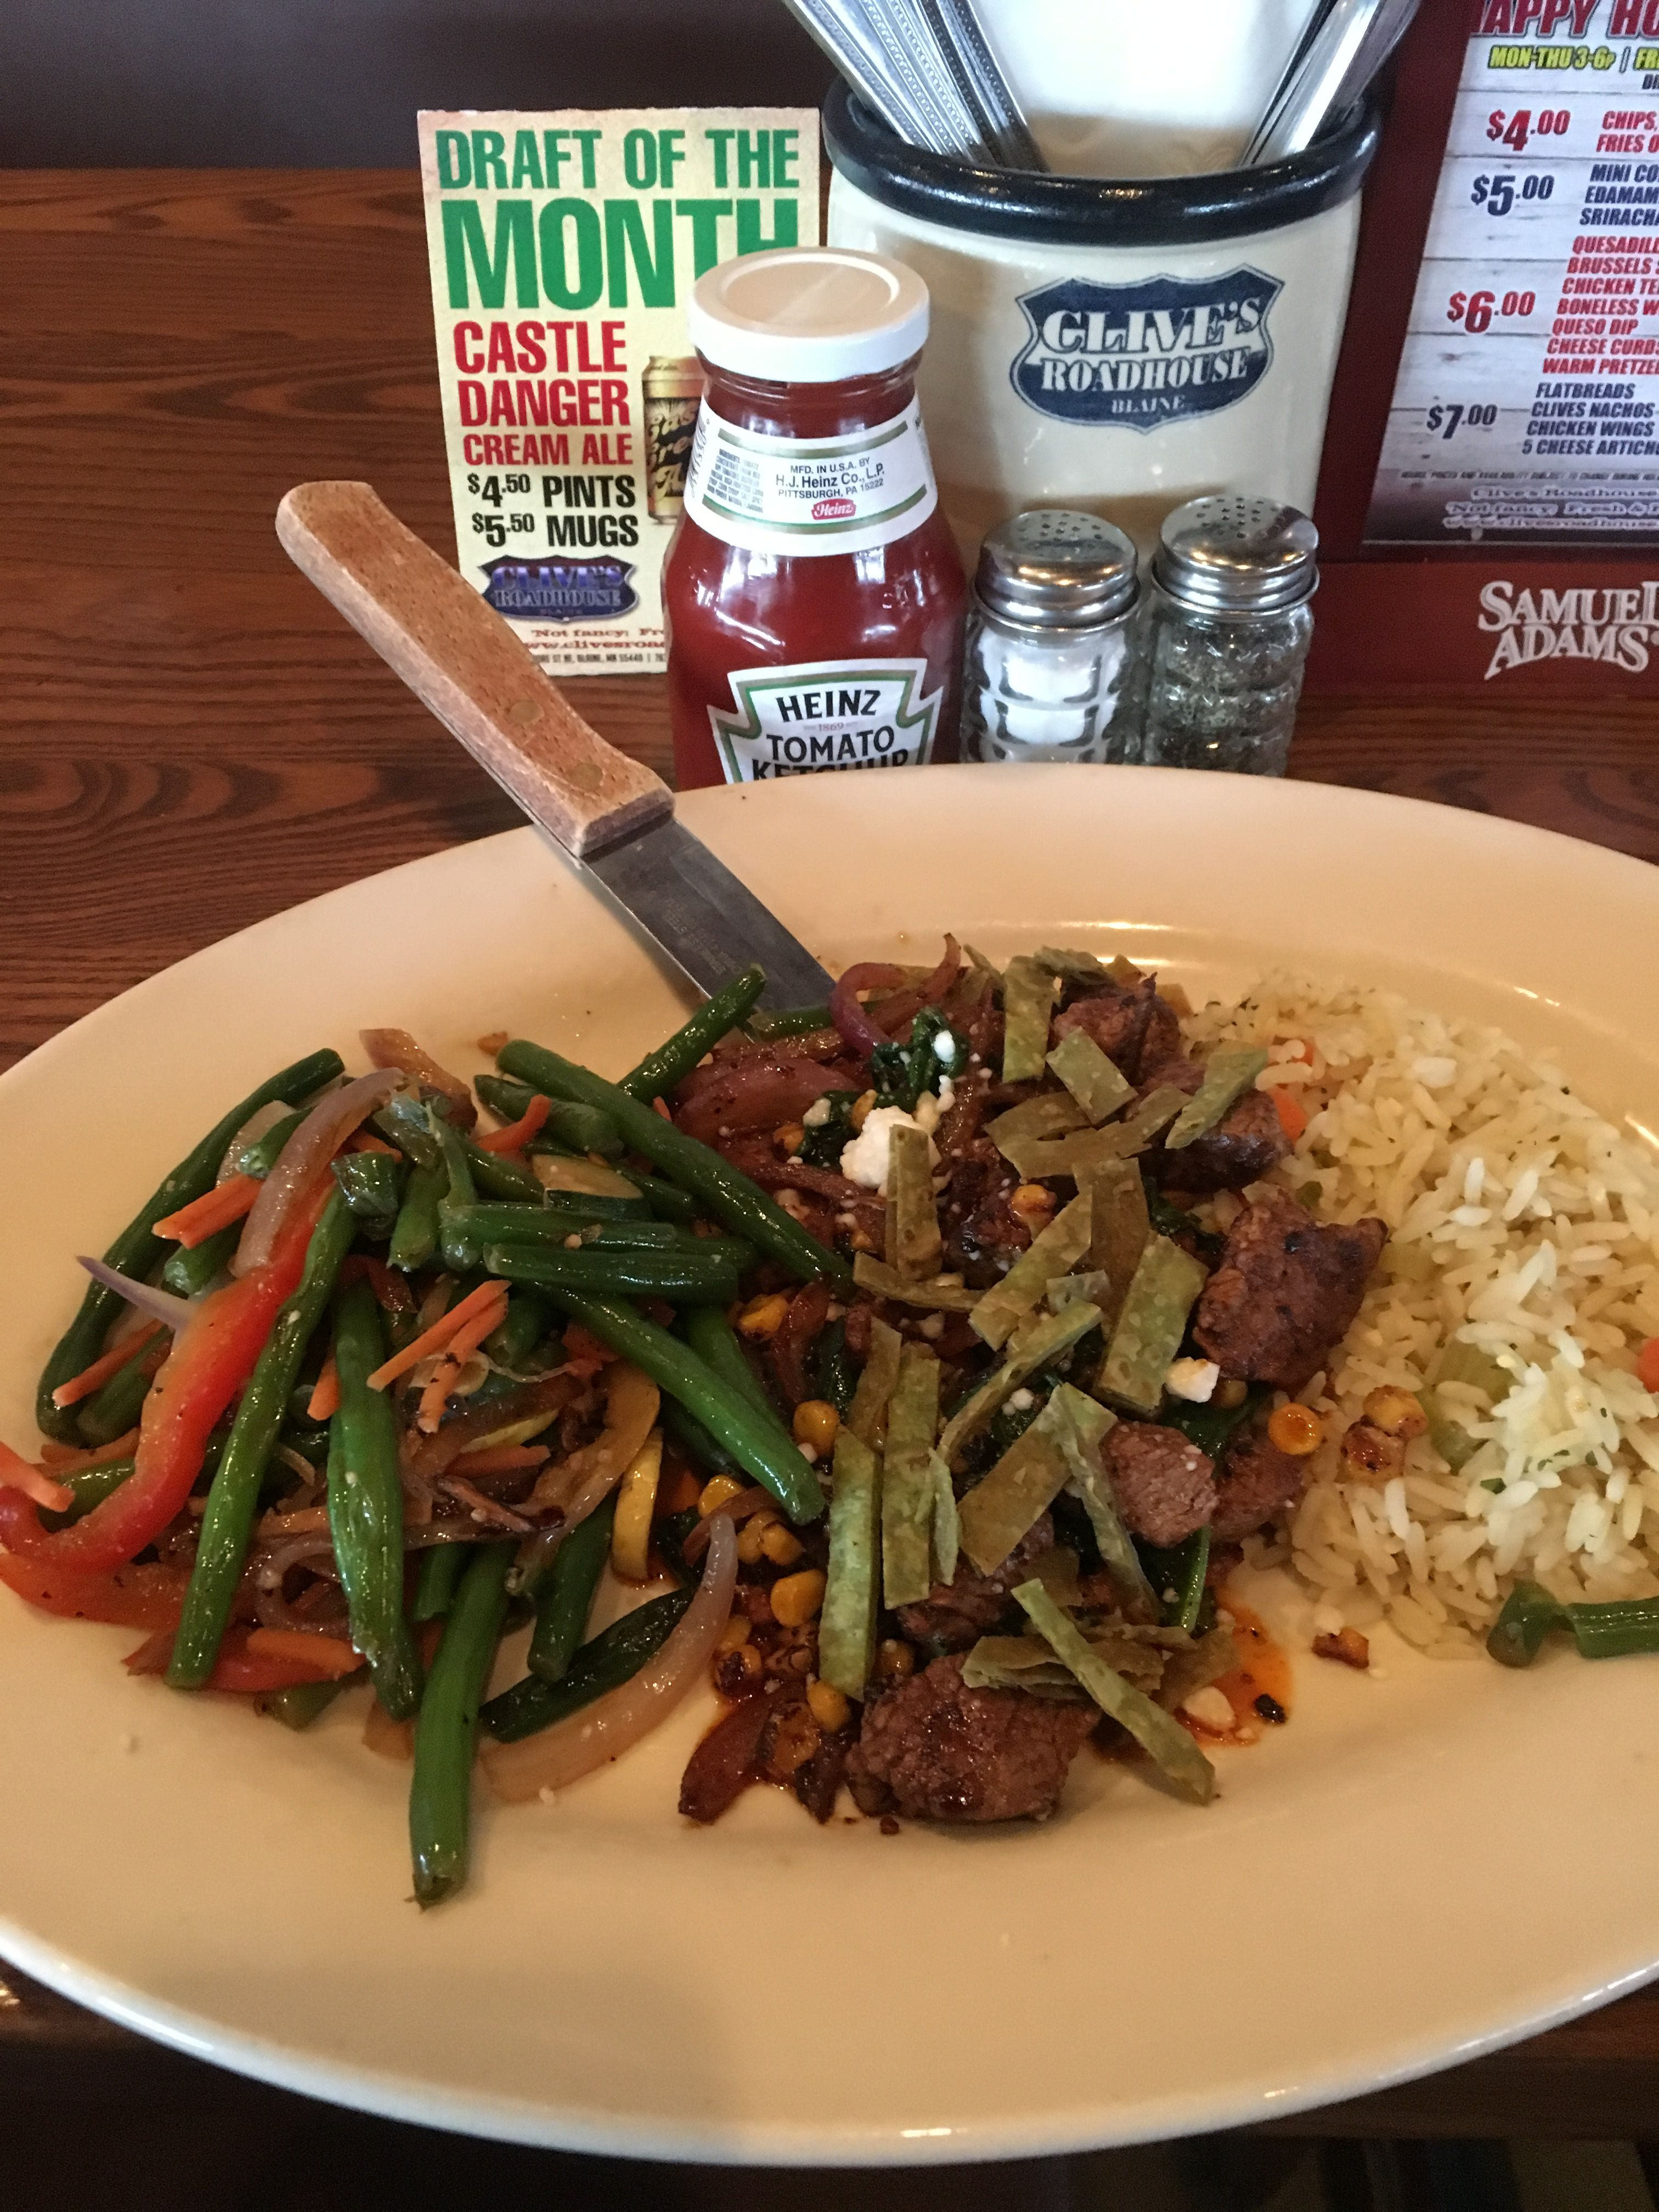 Tonight S Dinner Special Nashville Steak Platter Soup Brunswick Stew Food Clivesroadhouse Foo Goodfood Dining Restaurants